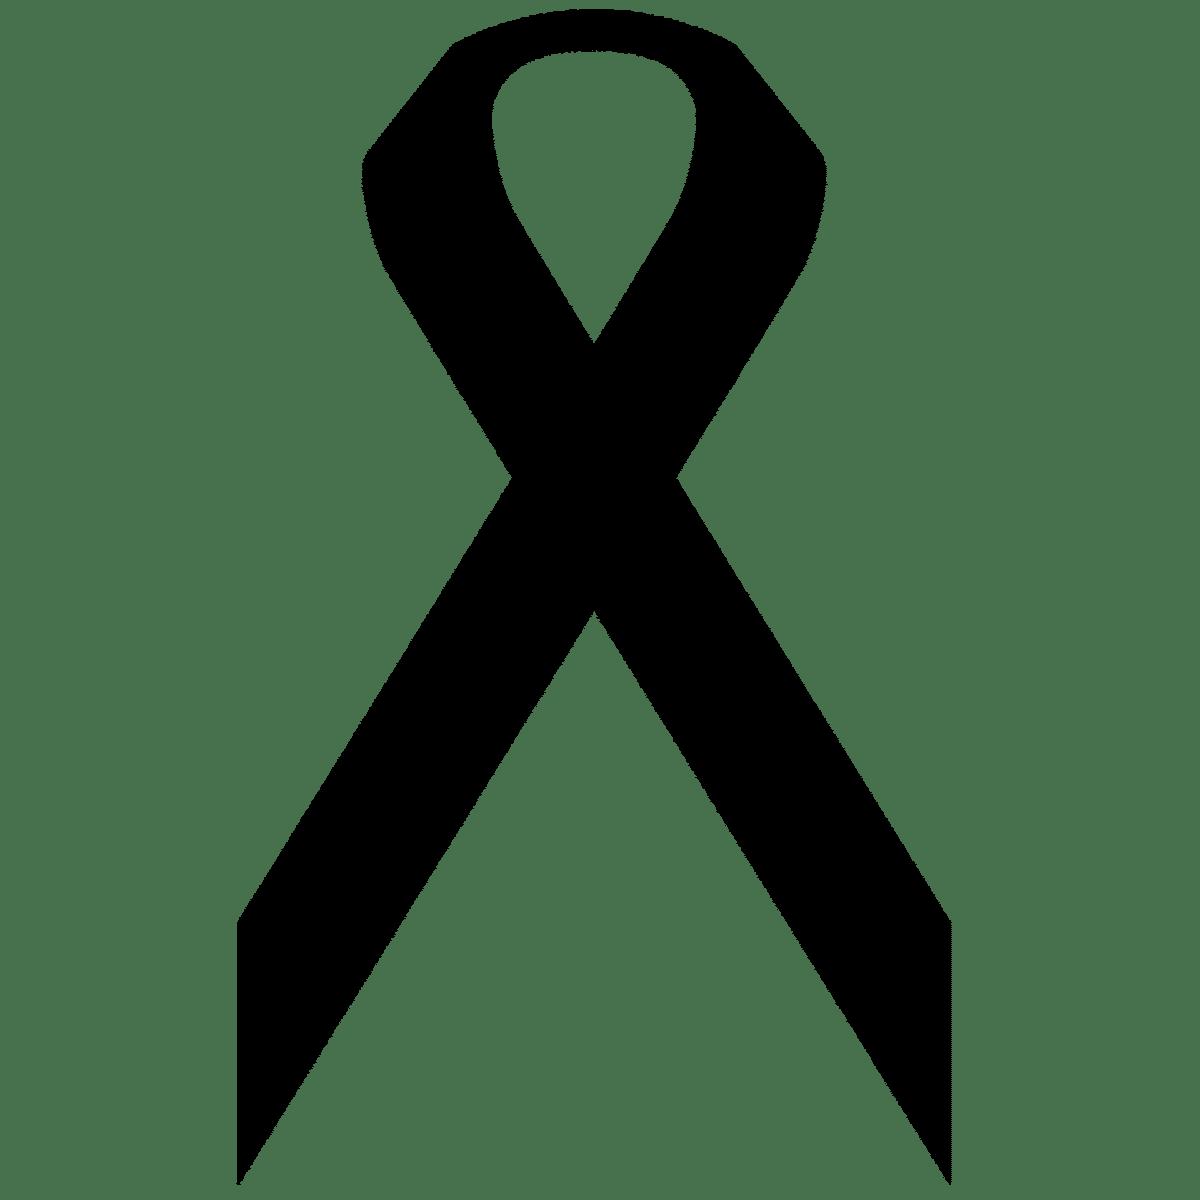 SIDA pixabay